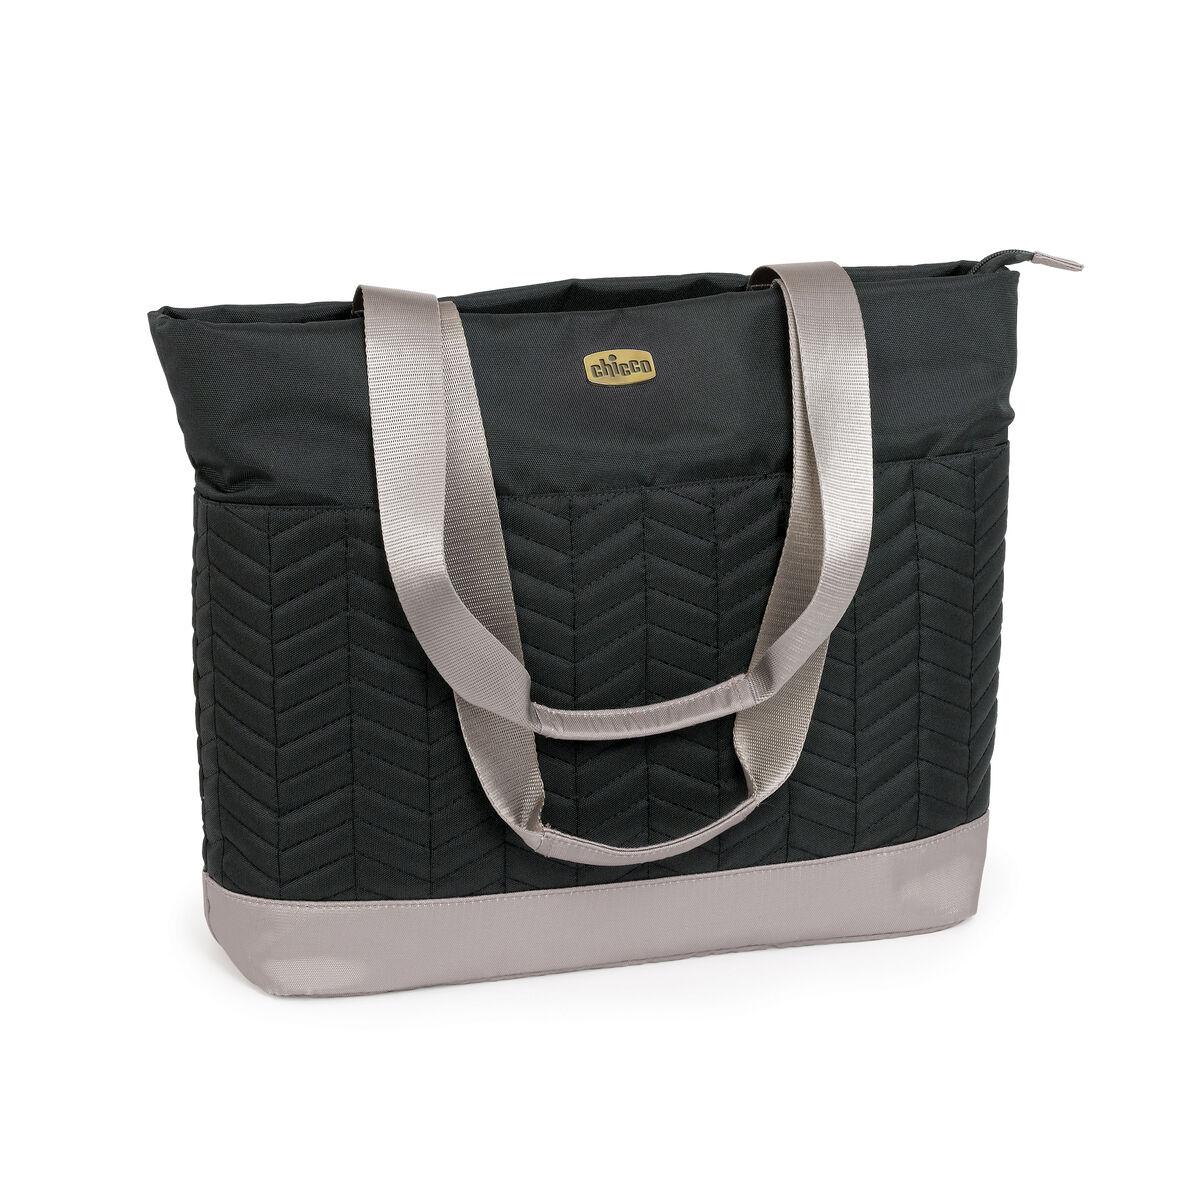 chicco chevron tote bag black. Black Bedroom Furniture Sets. Home Design Ideas